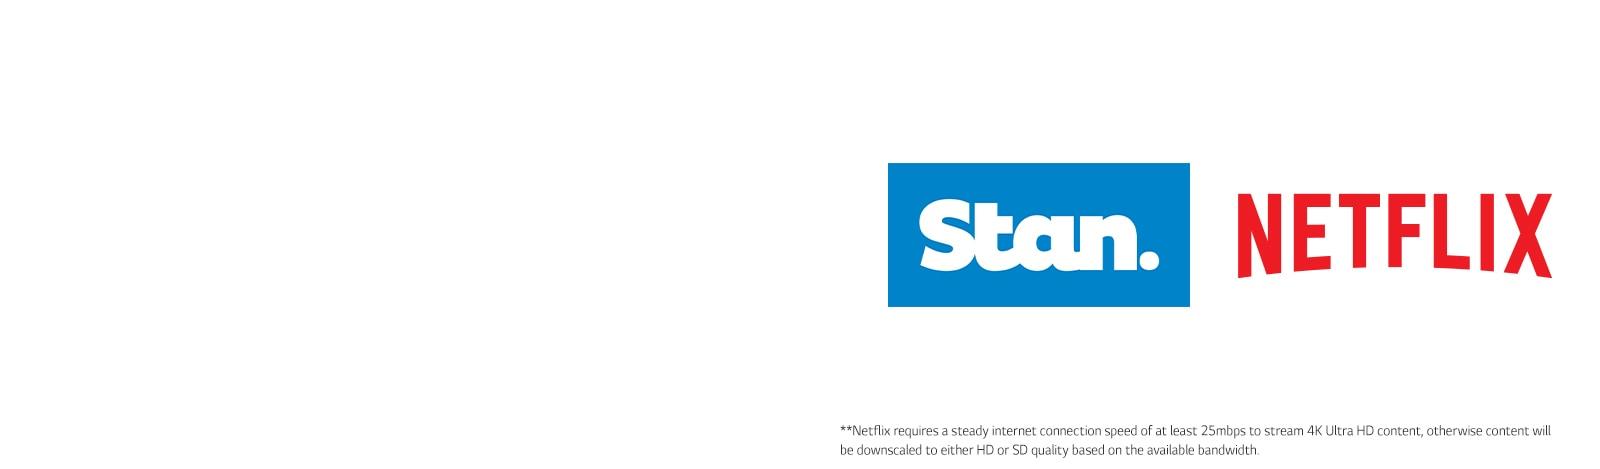 Smart-TV-Feature-Banner_RHS_1600x469_Disclaimer_V2